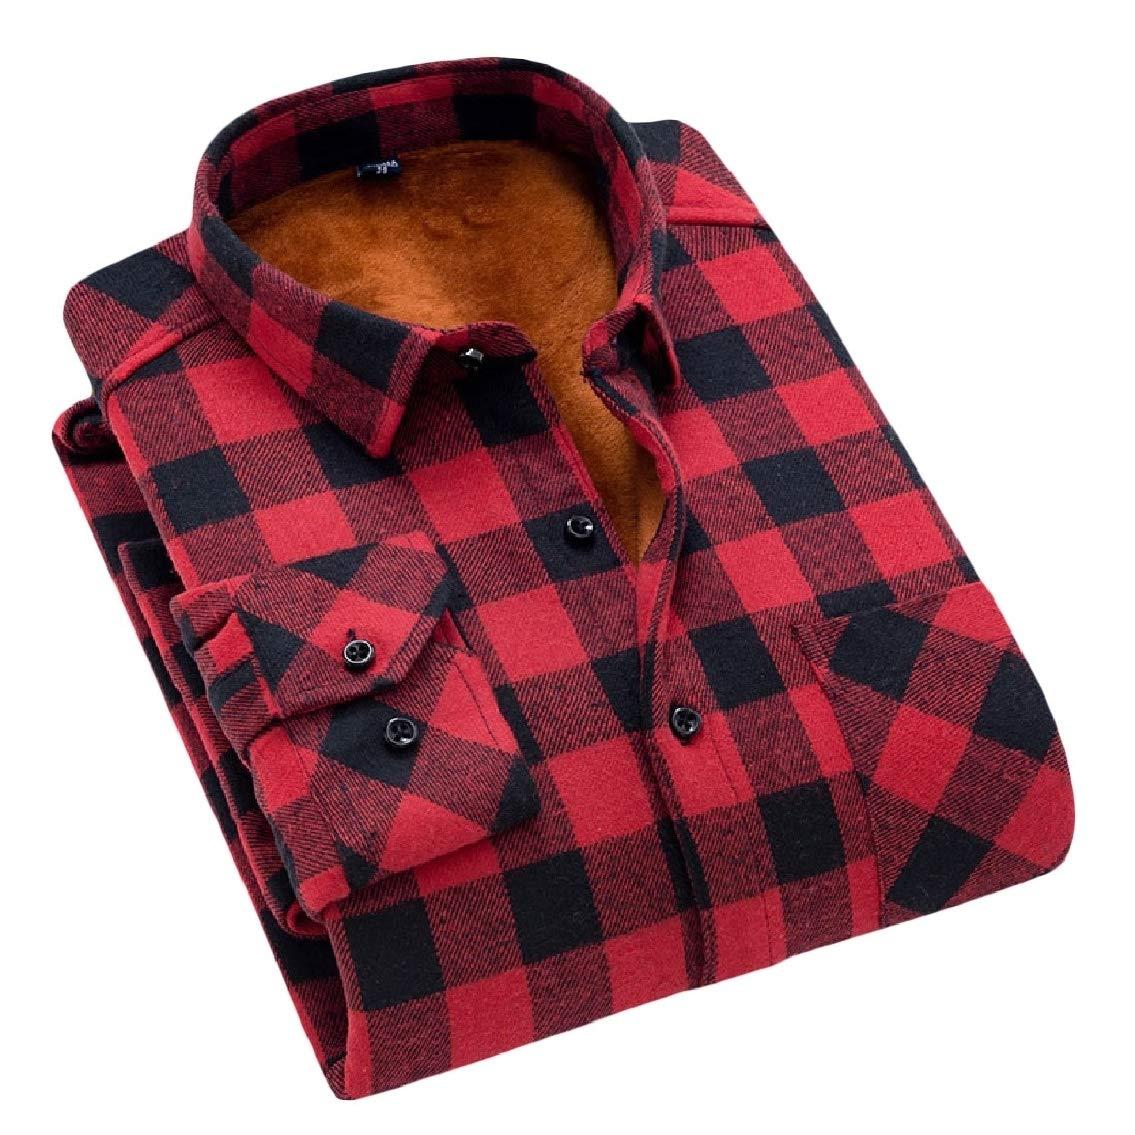 FreelyMen Autumn Winter Trim-Fit Casual Thick Flannel Plaid Warm Shirt